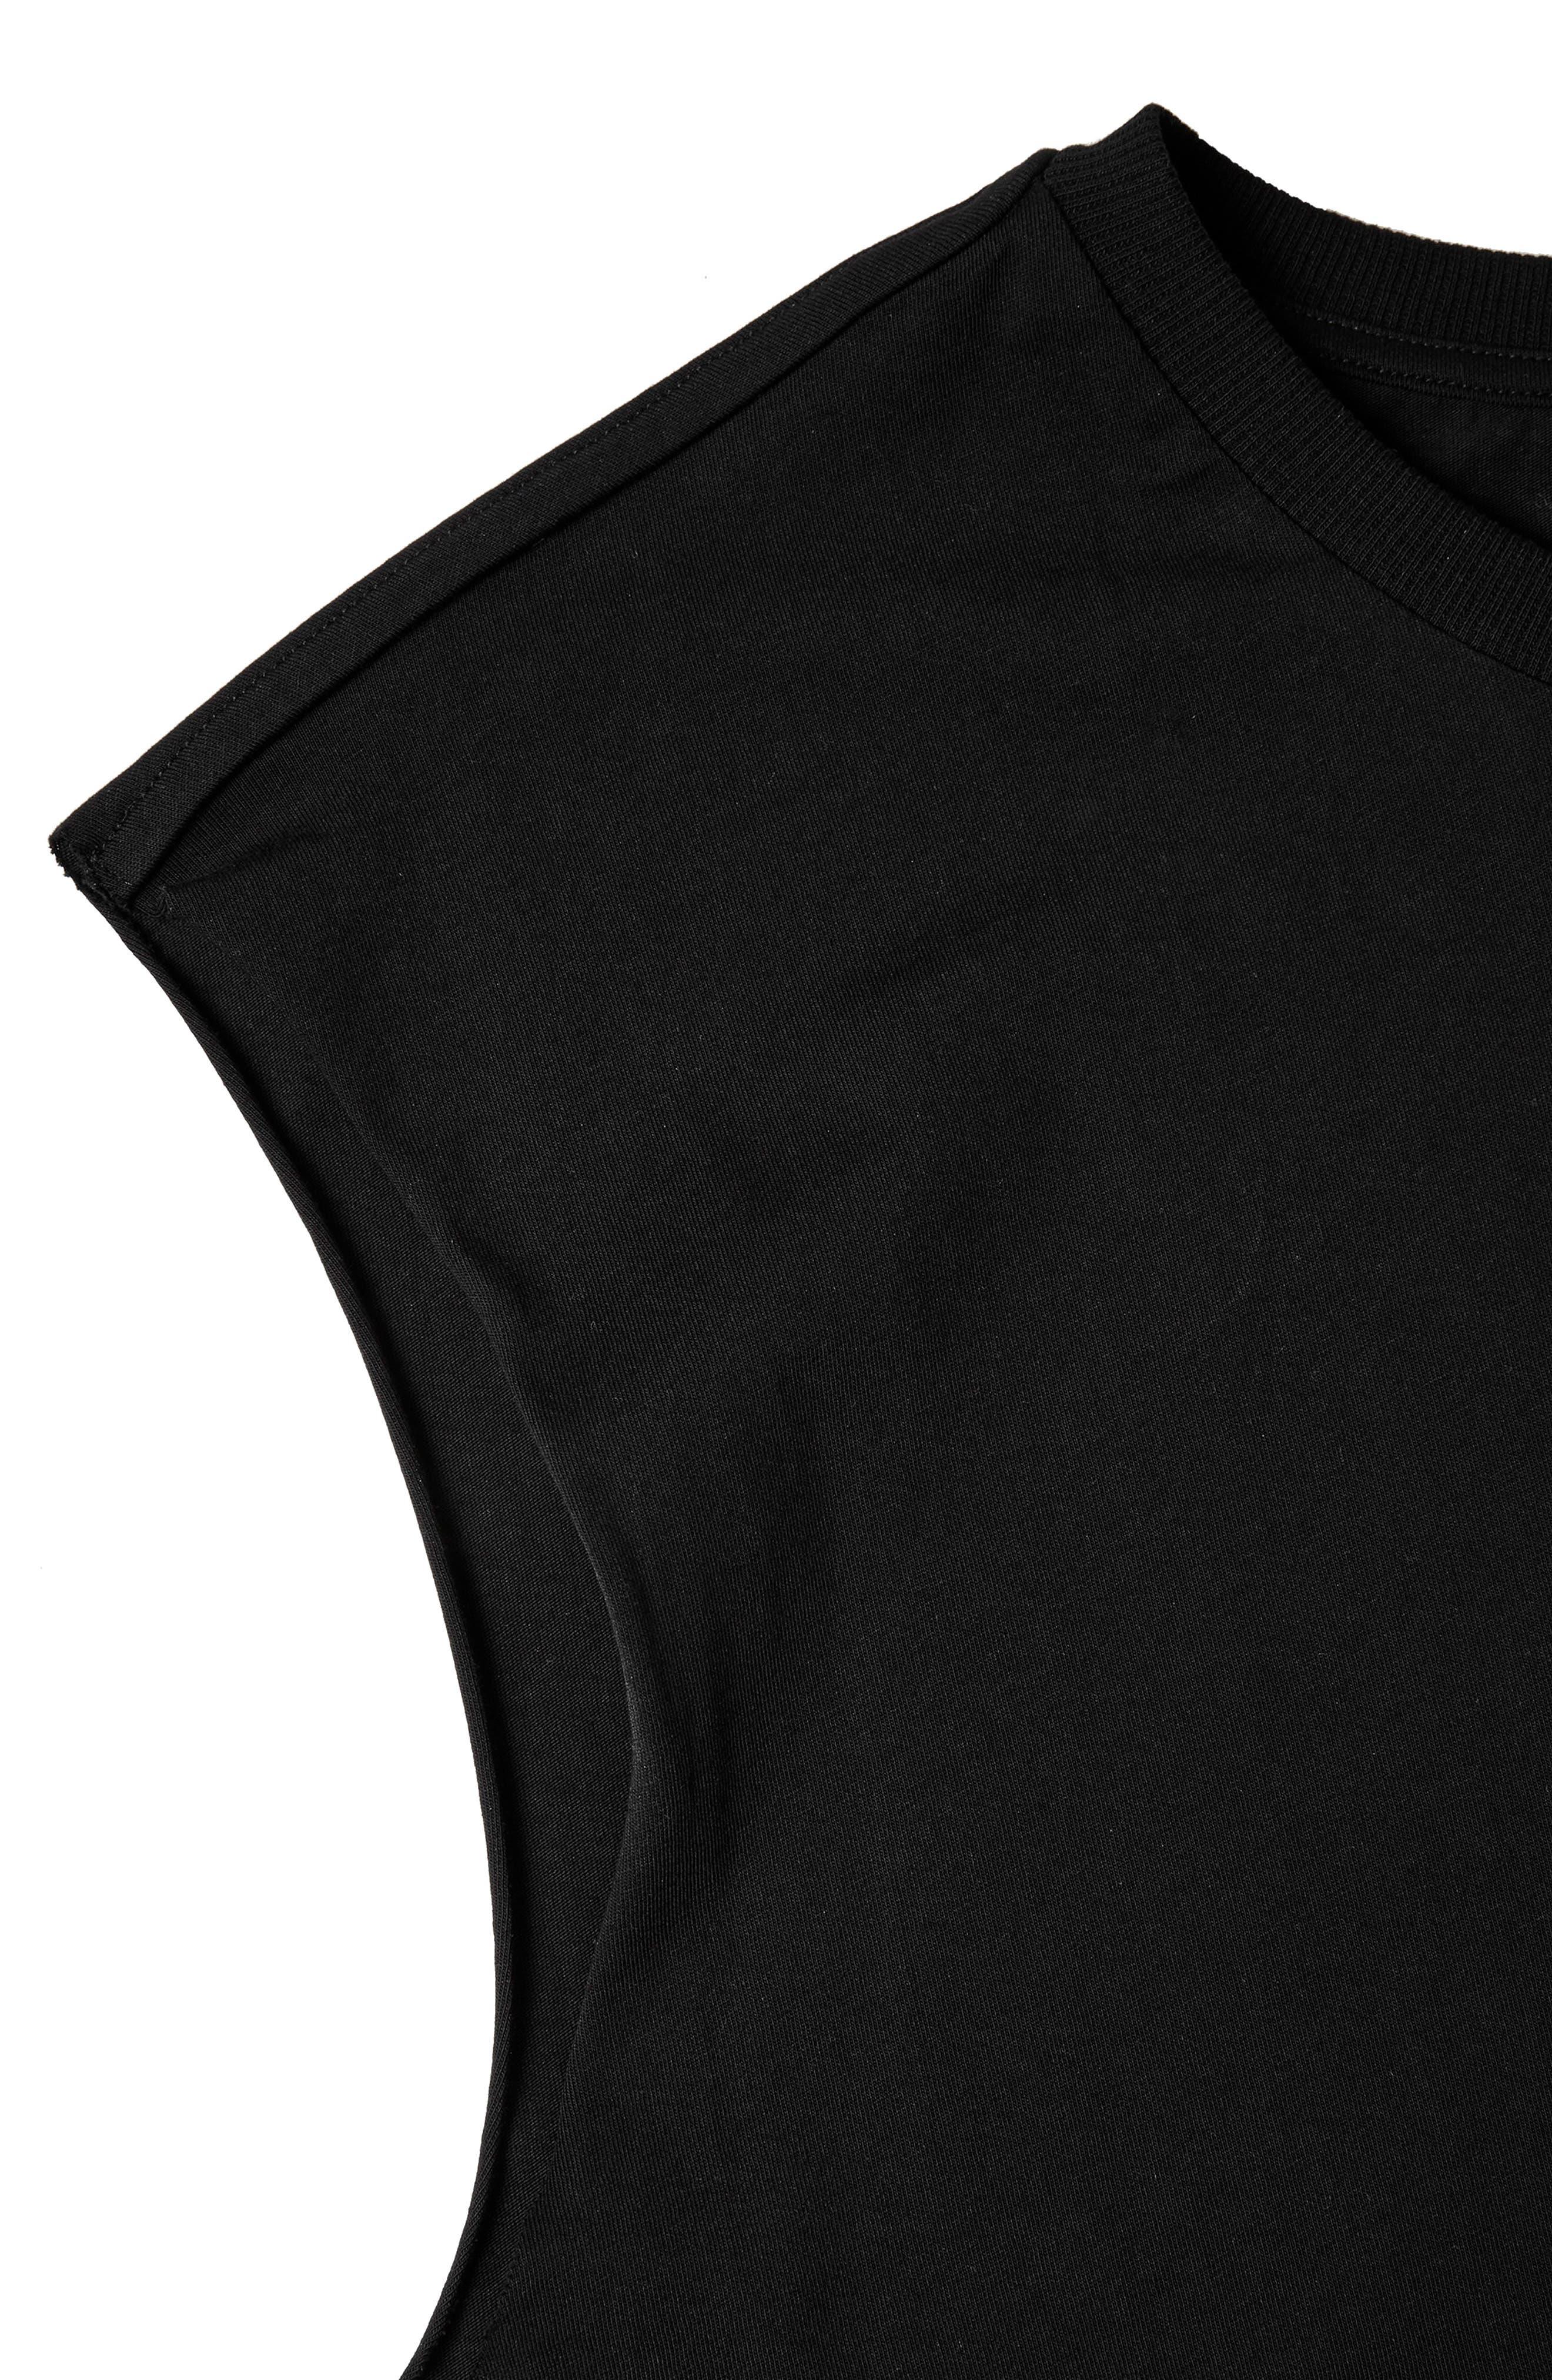 Raw Sleeve Top,                             Alternate thumbnail 2, color,                             Black